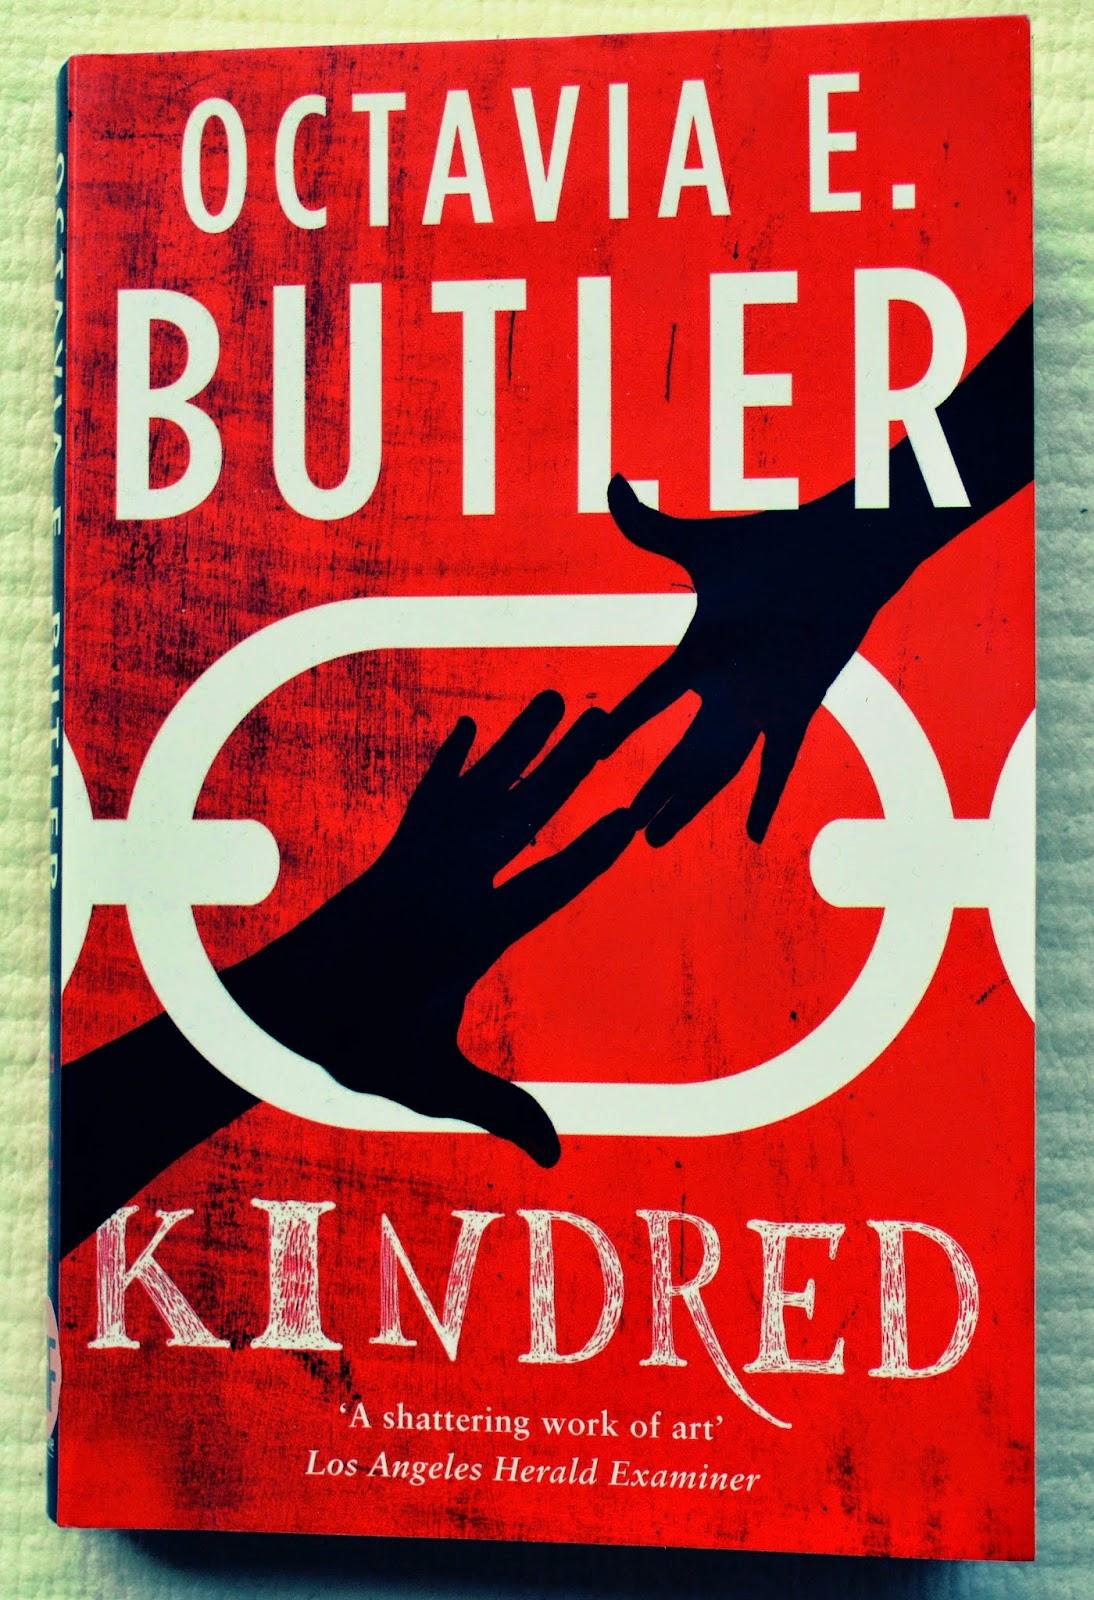 Kindred, science fiction, historical fiction, slave narrative, Octavia E Butler, paperback, review, plantation, slavery, summary, plot, read, book